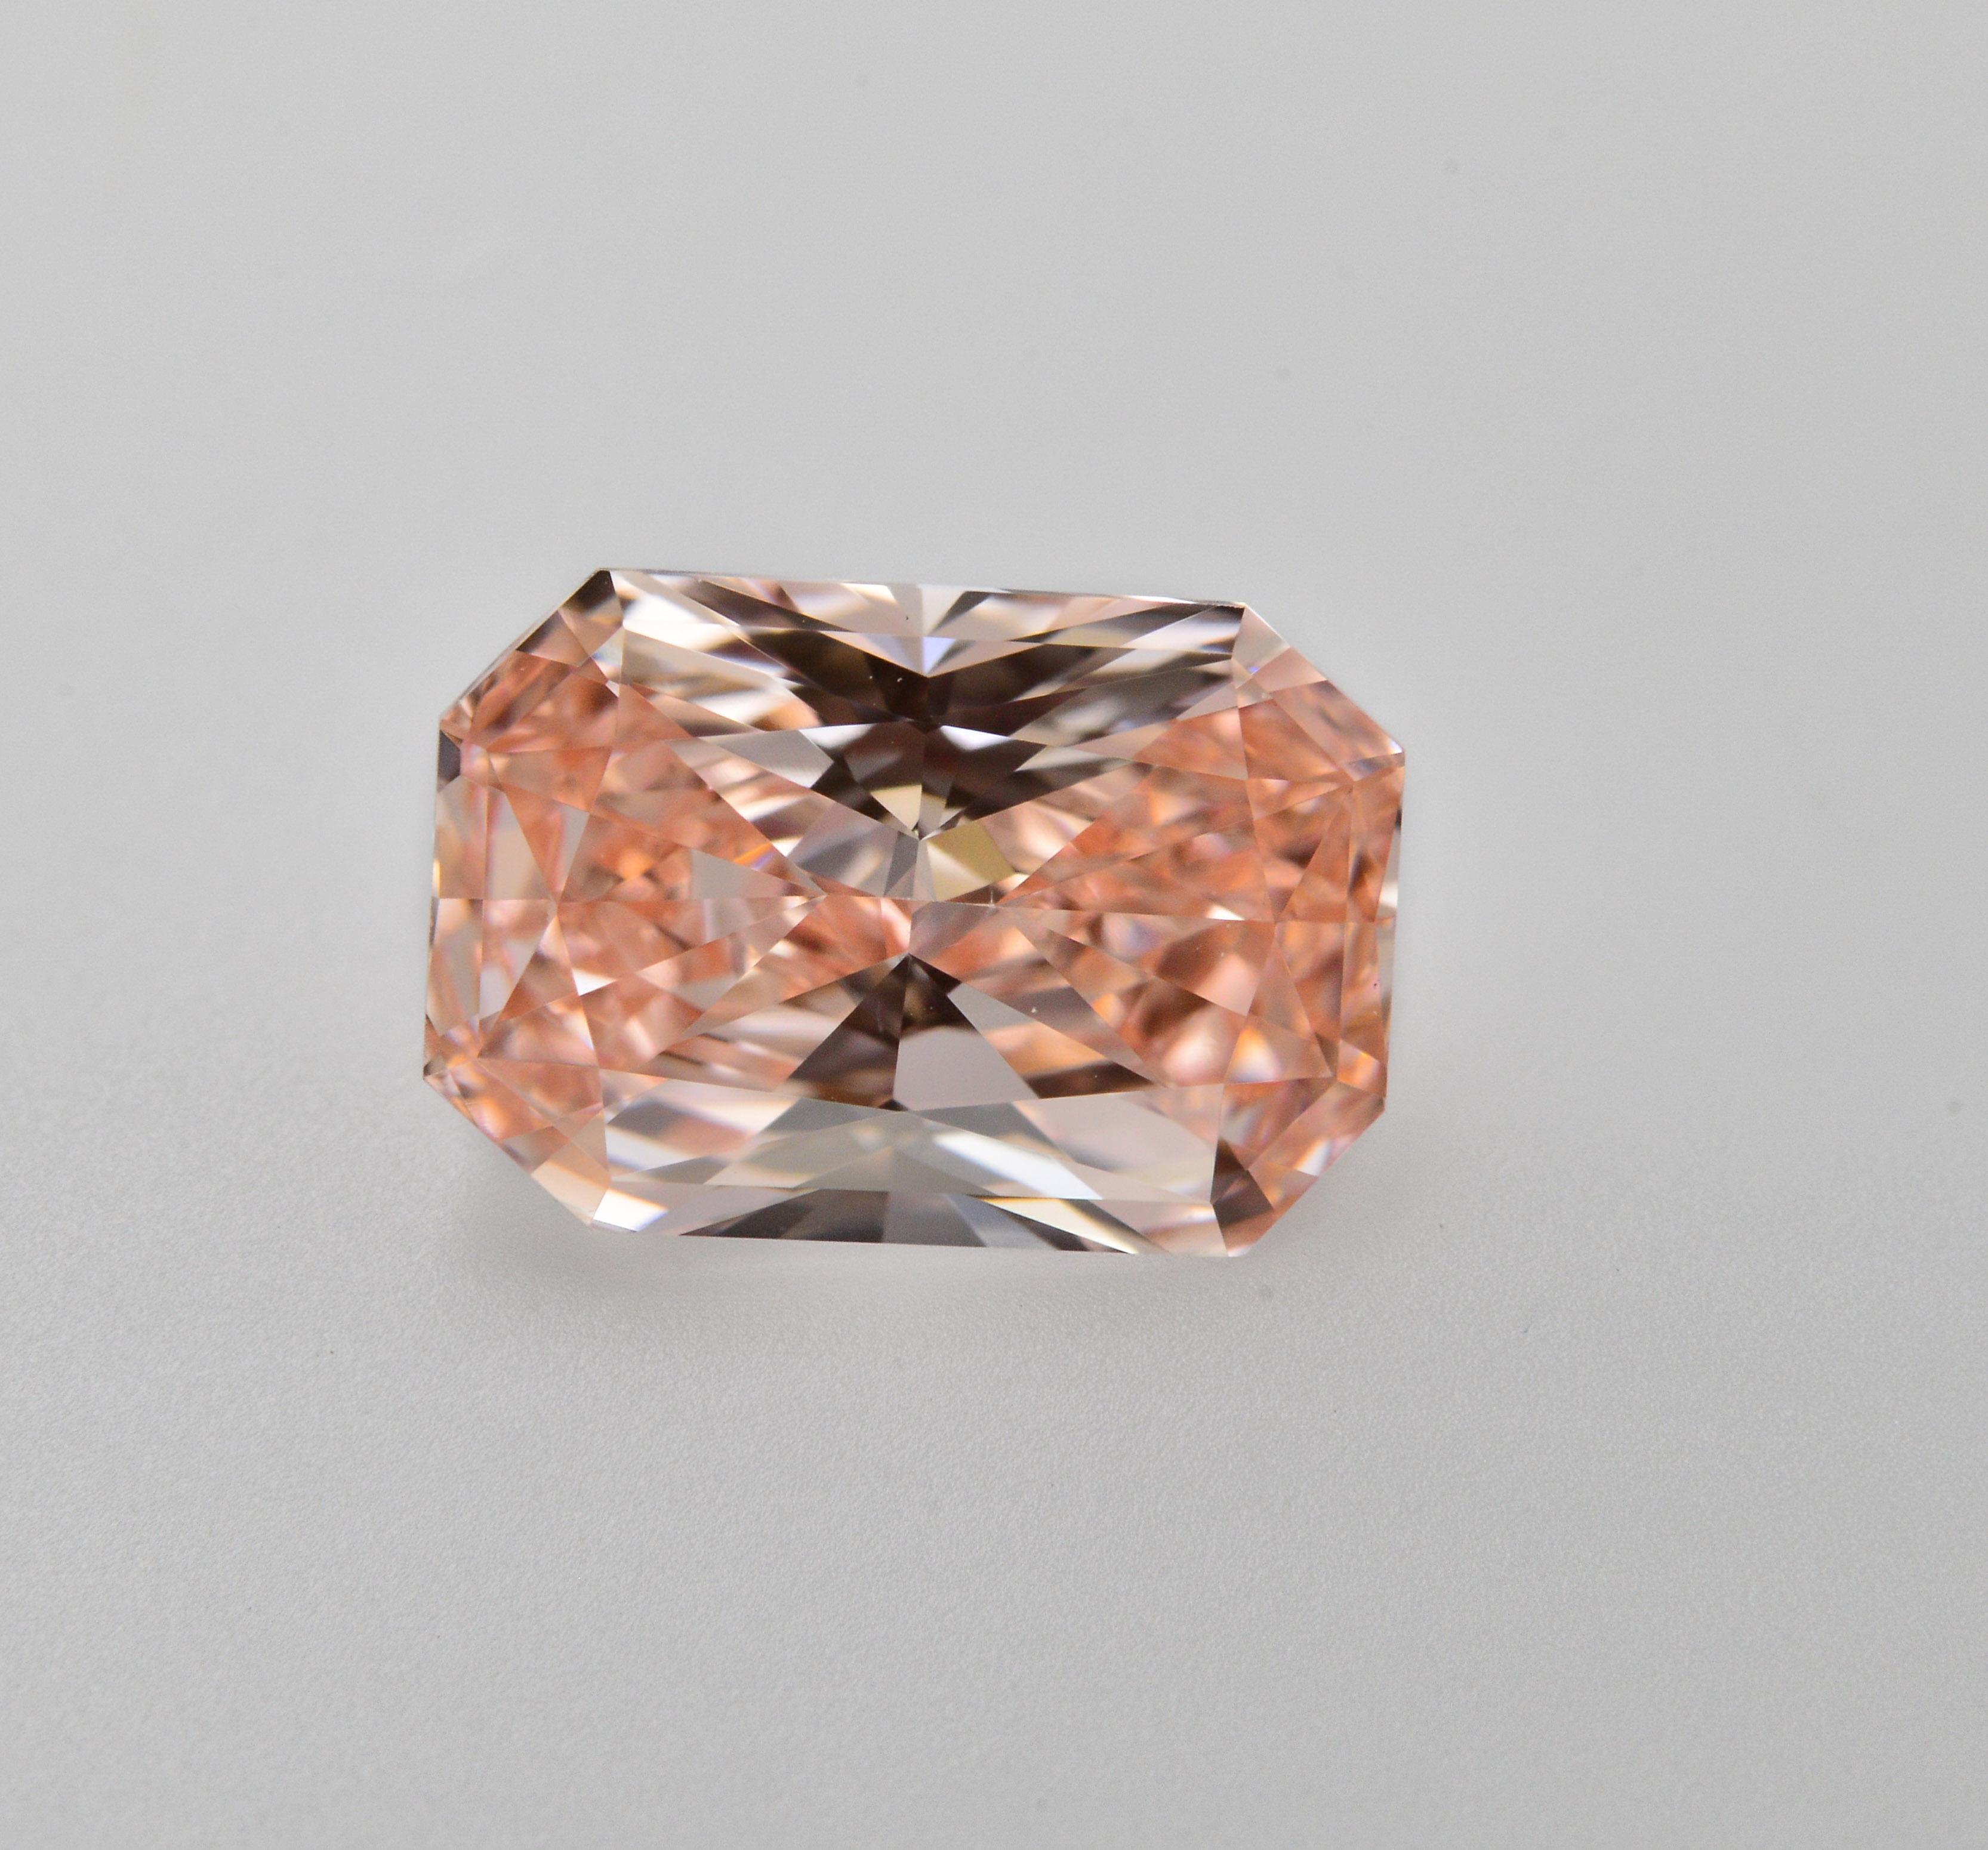 Pink Diamond, Radiant, Fancy Vivid Orangy Pink, 1.04 Carat